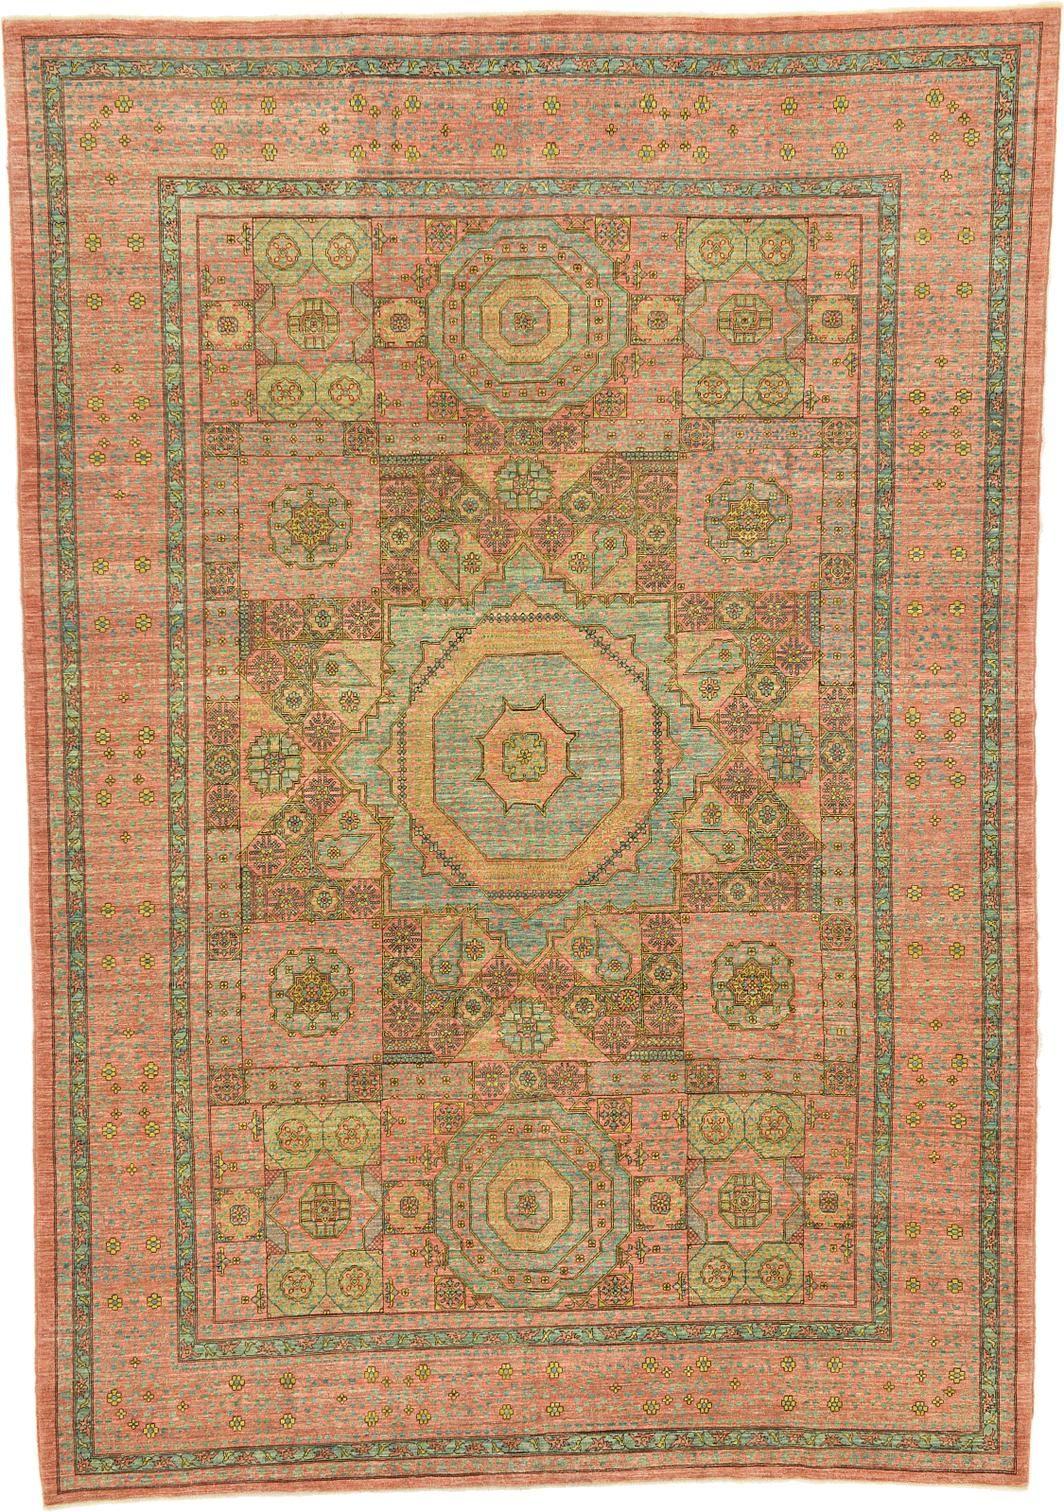 Peach 7 11 X 11 5 Mamluk Ziegler Oriental Rug Oriental Rugs Peach Rug Oriental Rug Rugs